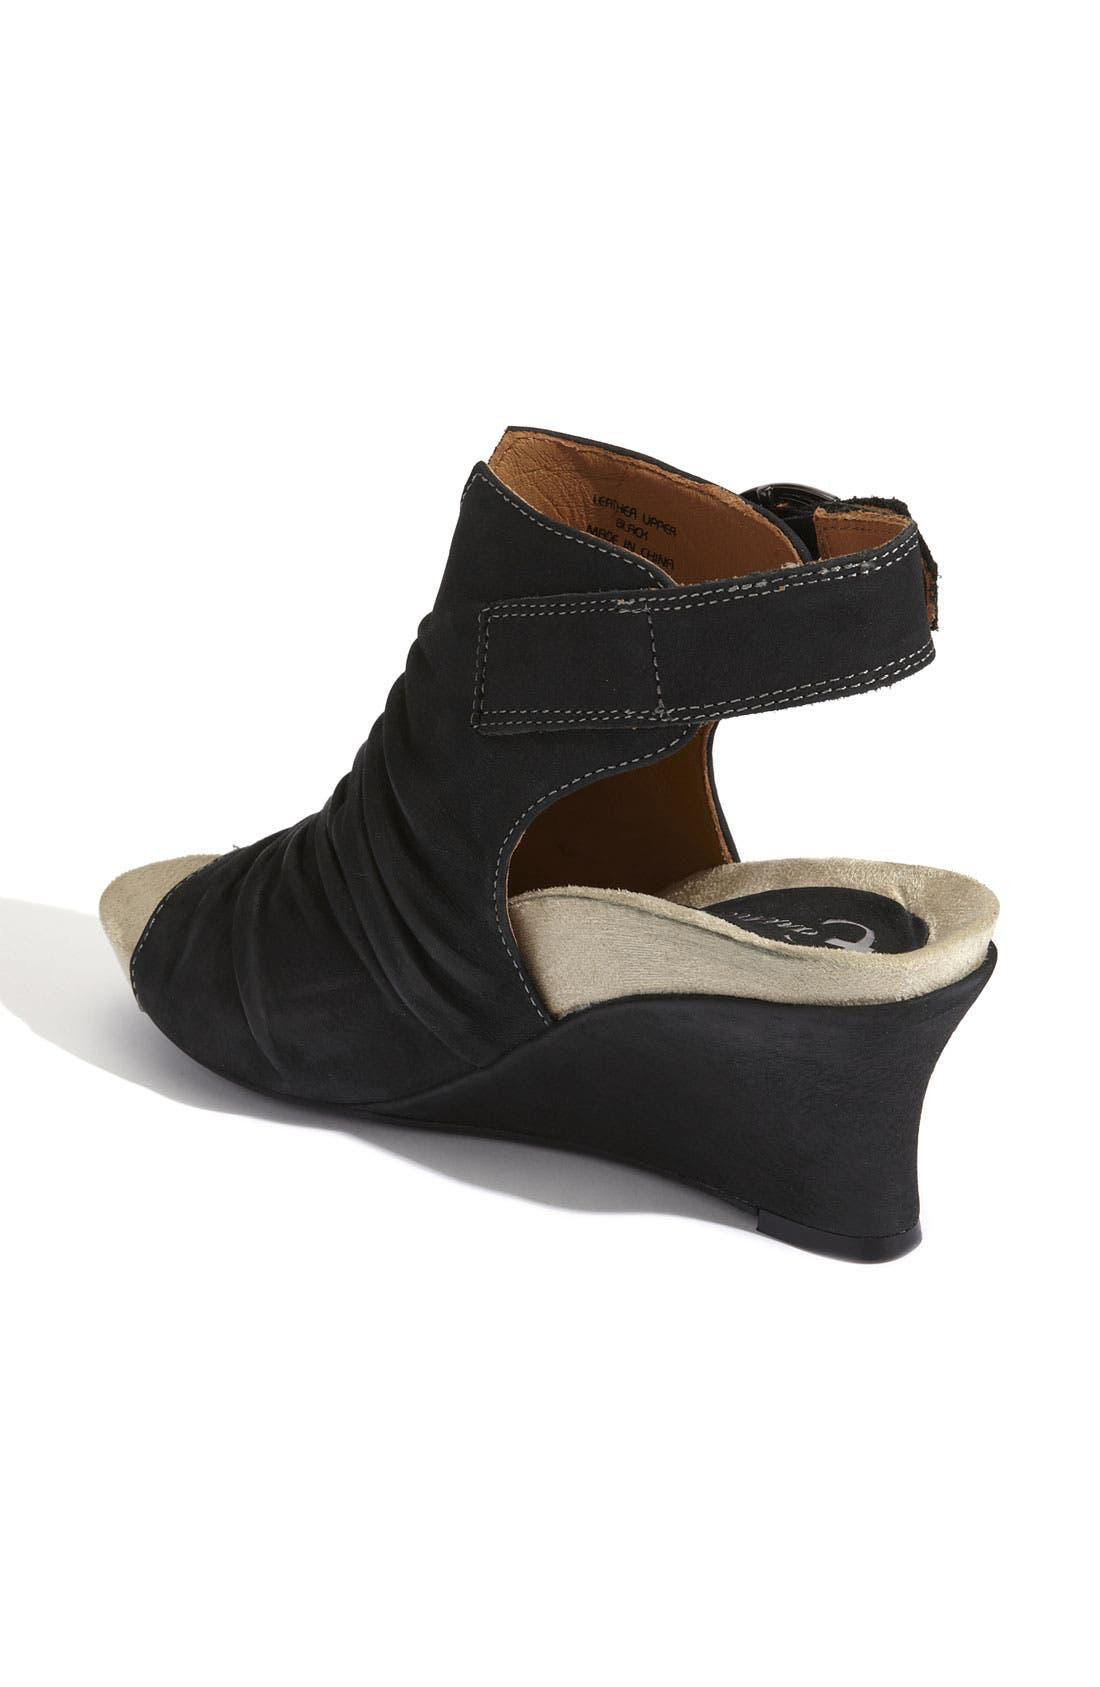 Alternate Image 2  - Earthies® 'Bonaire Too' Wedge Sandal